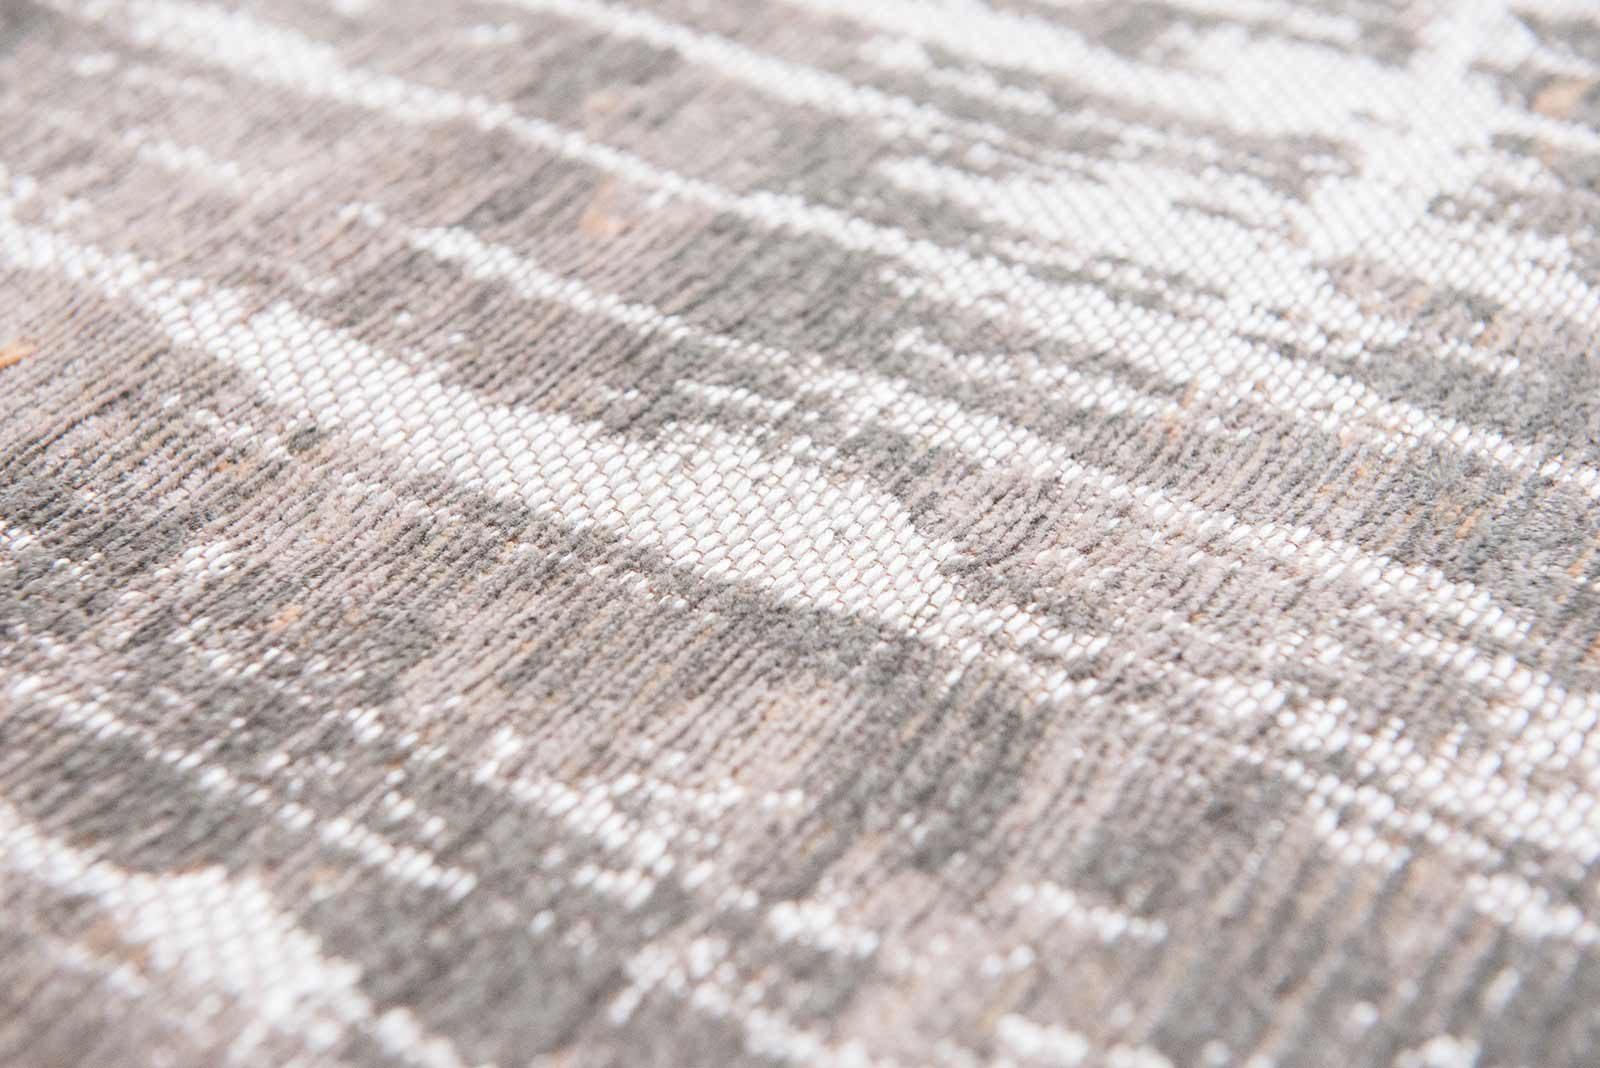 rugs Louis De Poortere LX8717 Atlantic Streaks Parsons Powder zoom 1